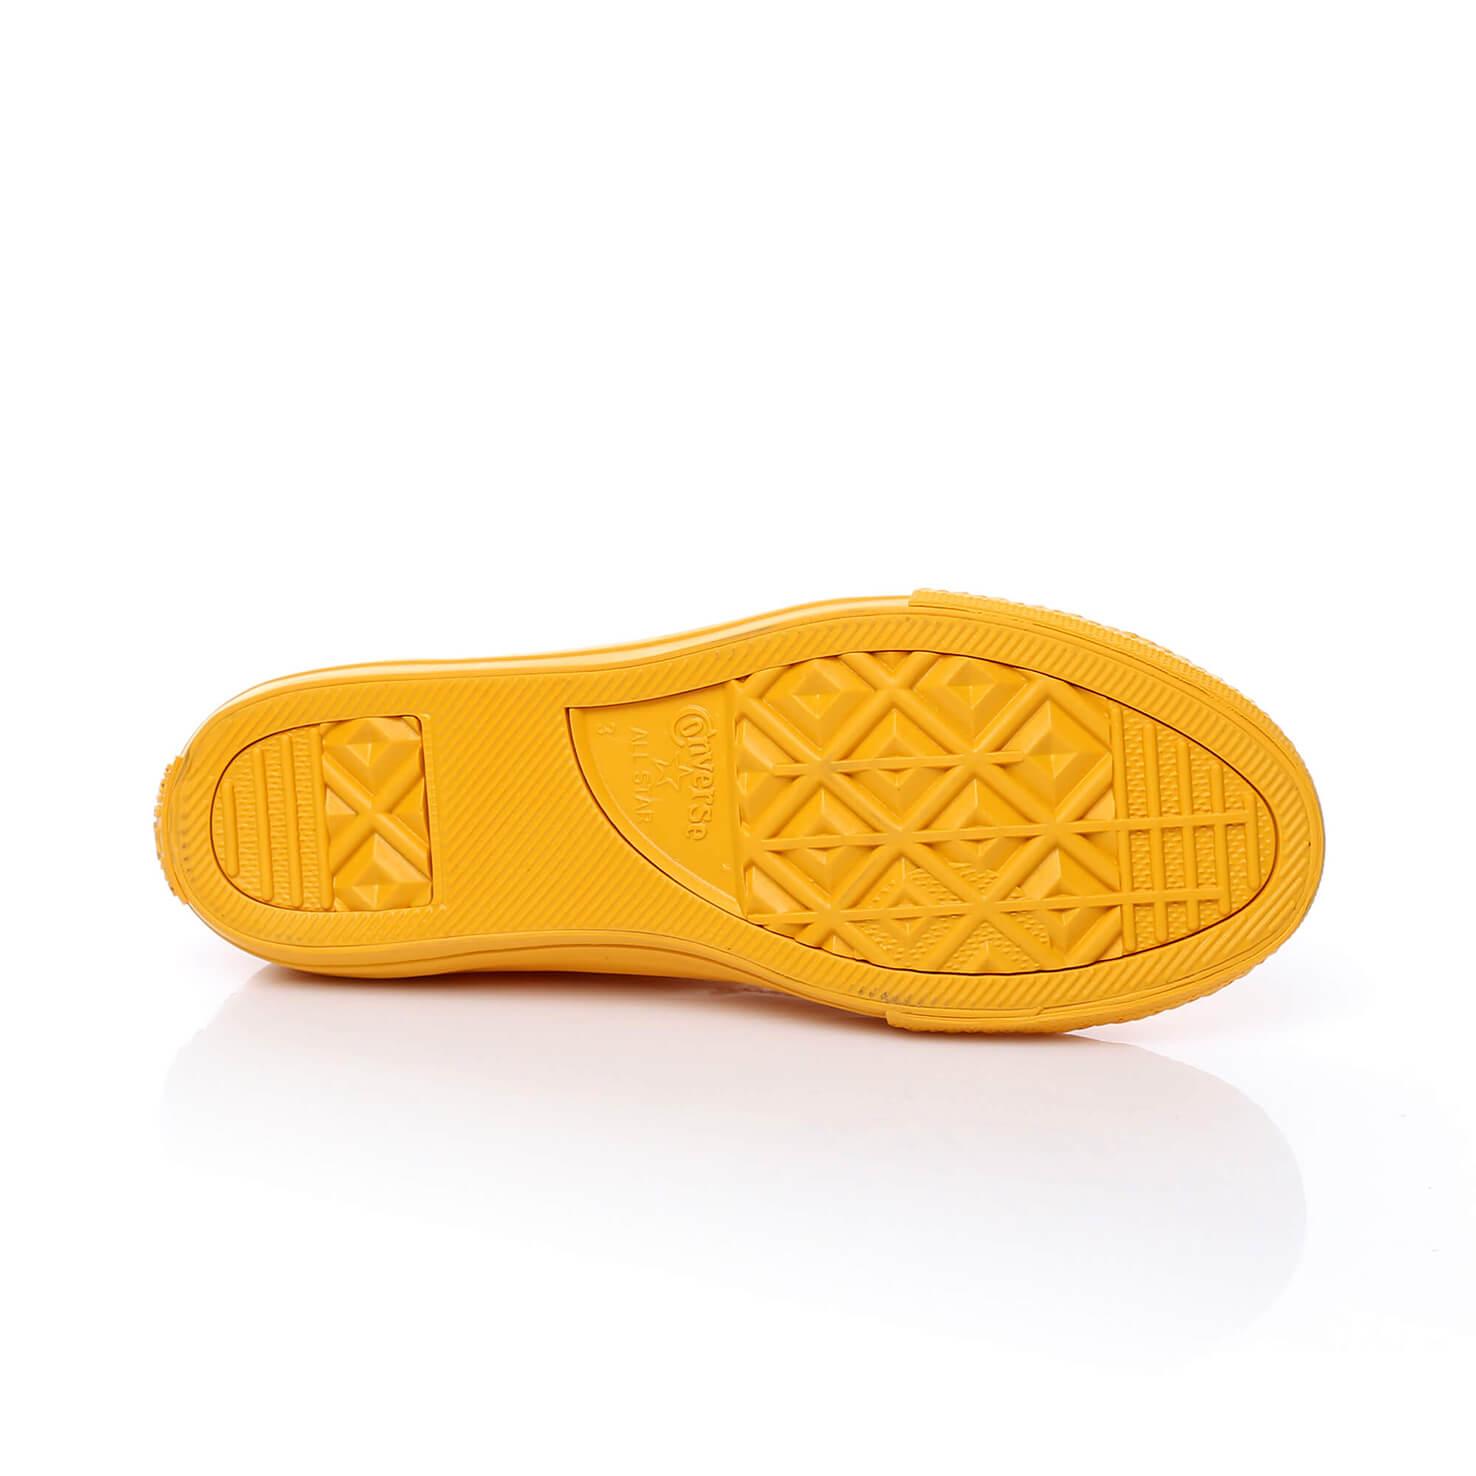 Converse Chuck Taylor All Star Çocuk Sarı Sneaker